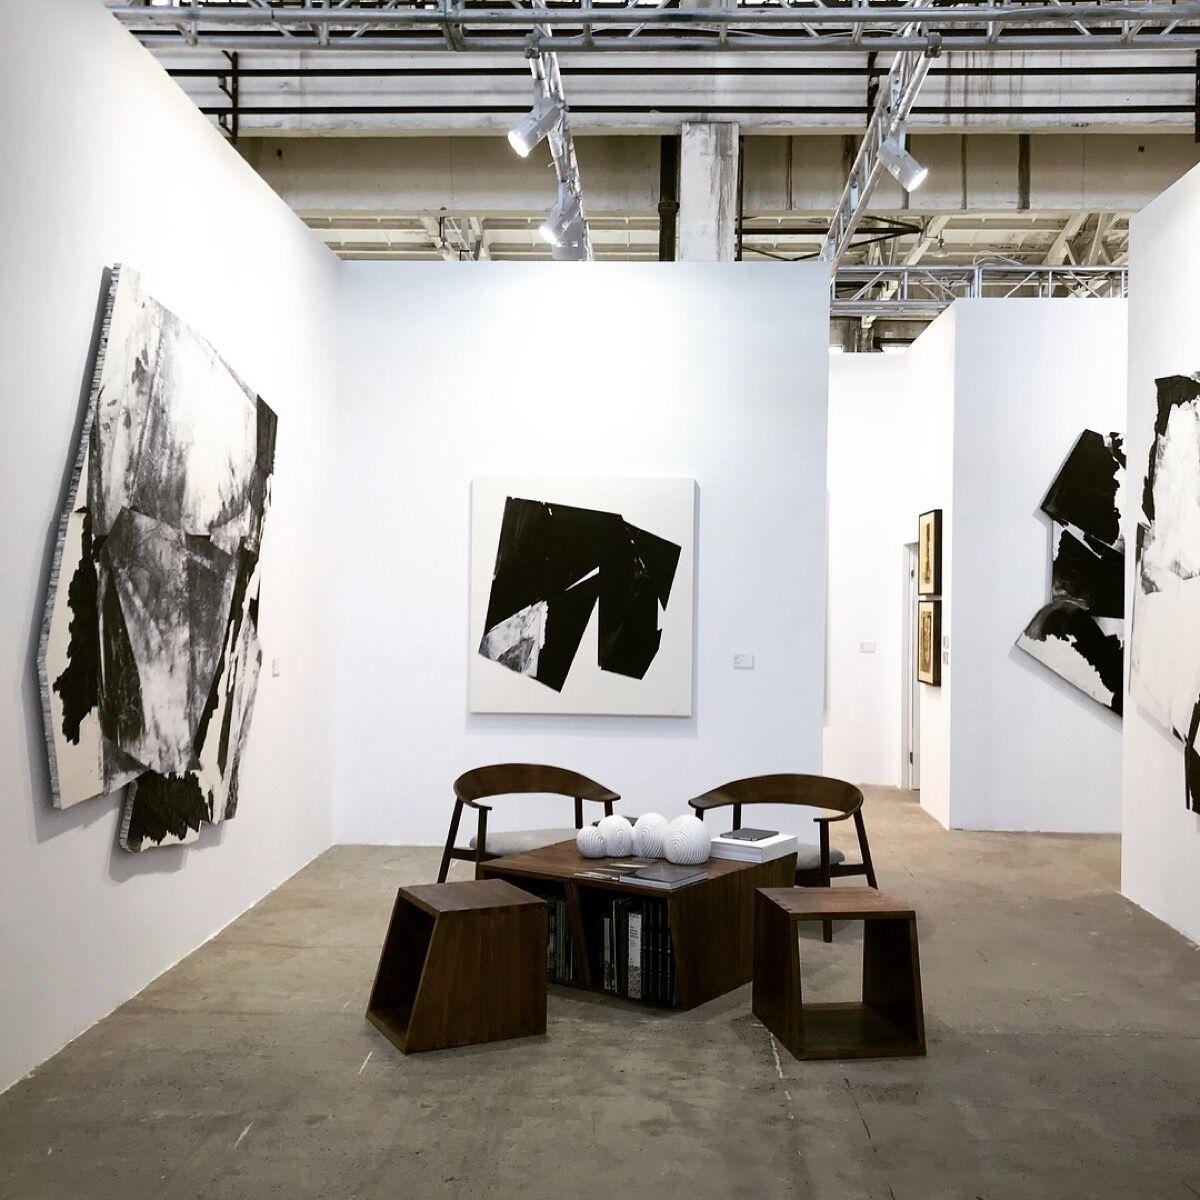 Installation view of Ink Studio's booth at West Bund Art & Design, 2017. Courtesy of Ink Studio.